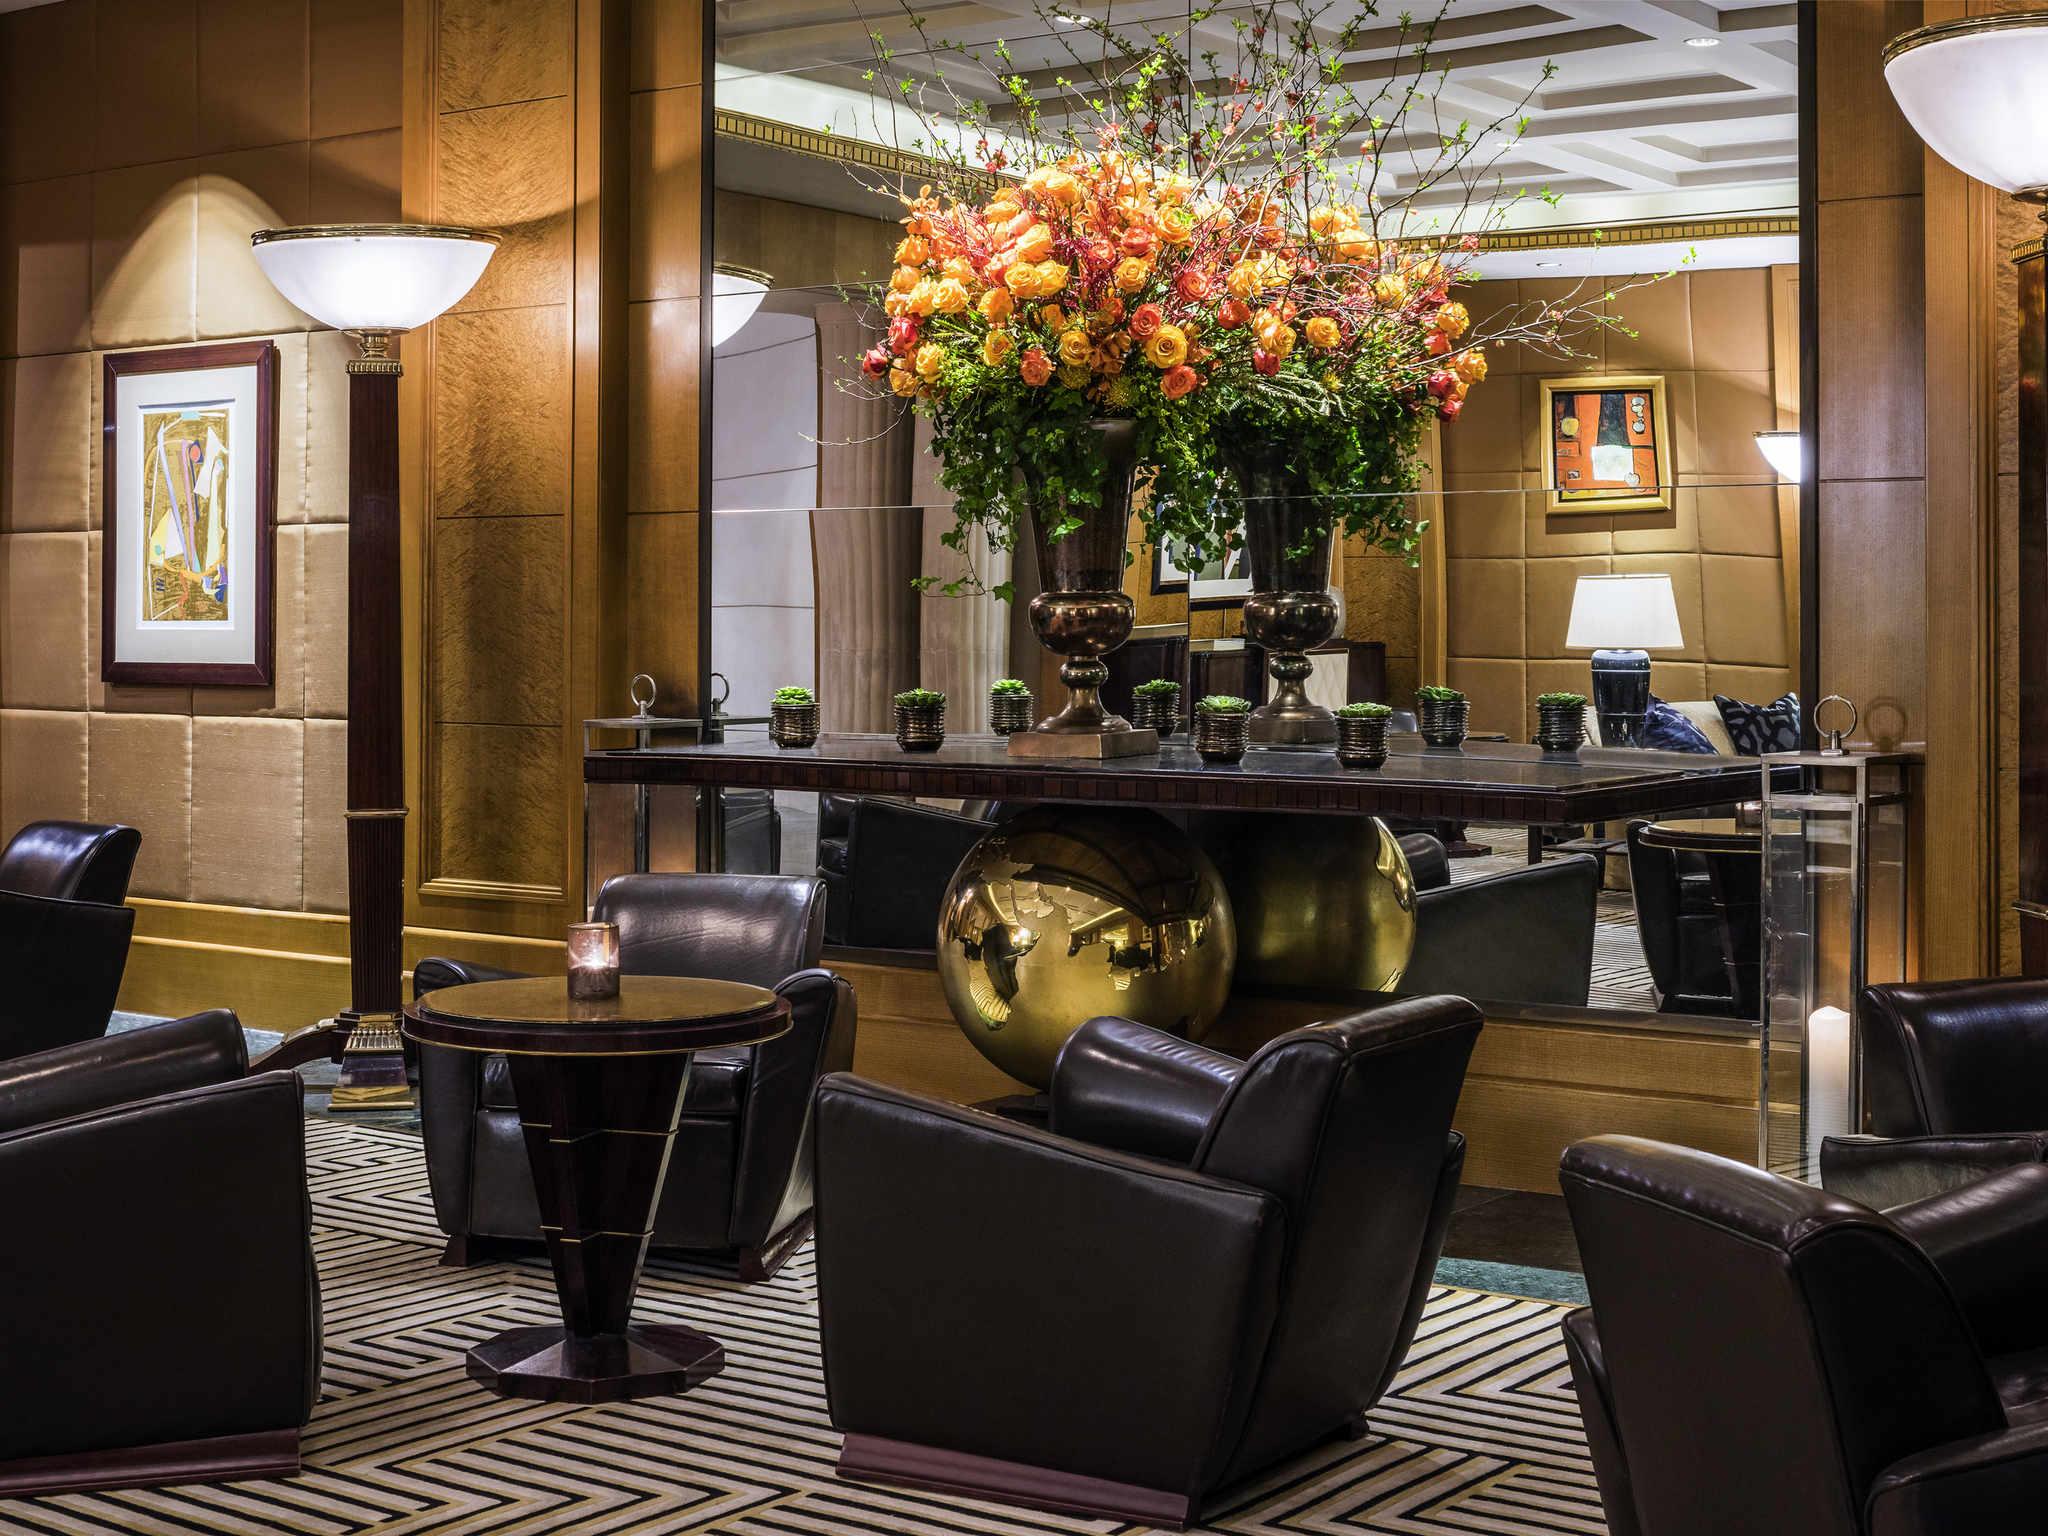 فندق - سوفيتل Sofitel نيويورك